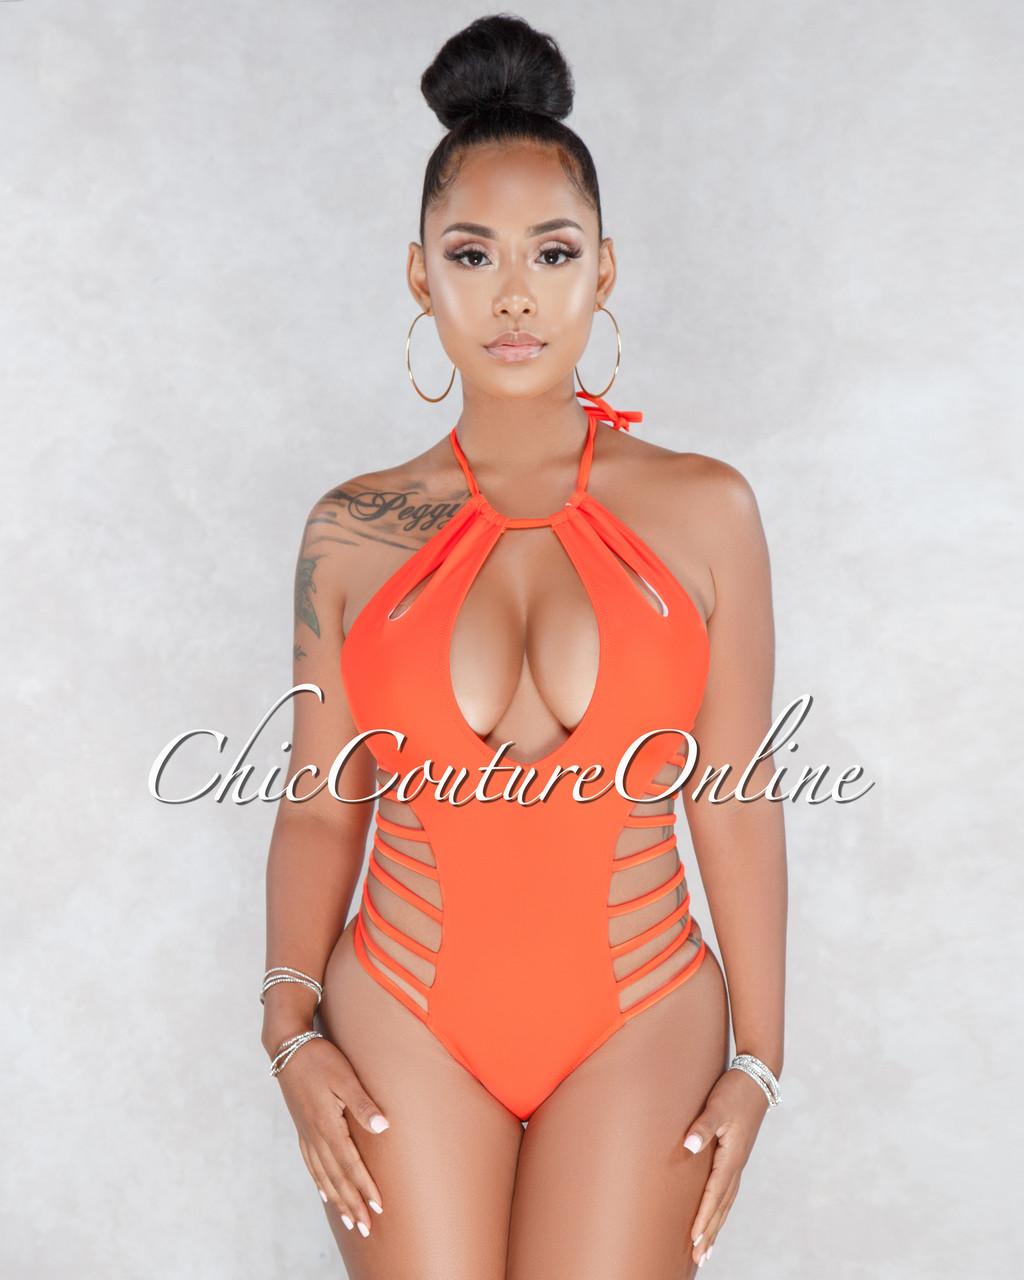 f0d1da2916 Cressida Orange Halter Cut Out Strappy One Piece Swimsuit. Price: $50.00.  Image 1